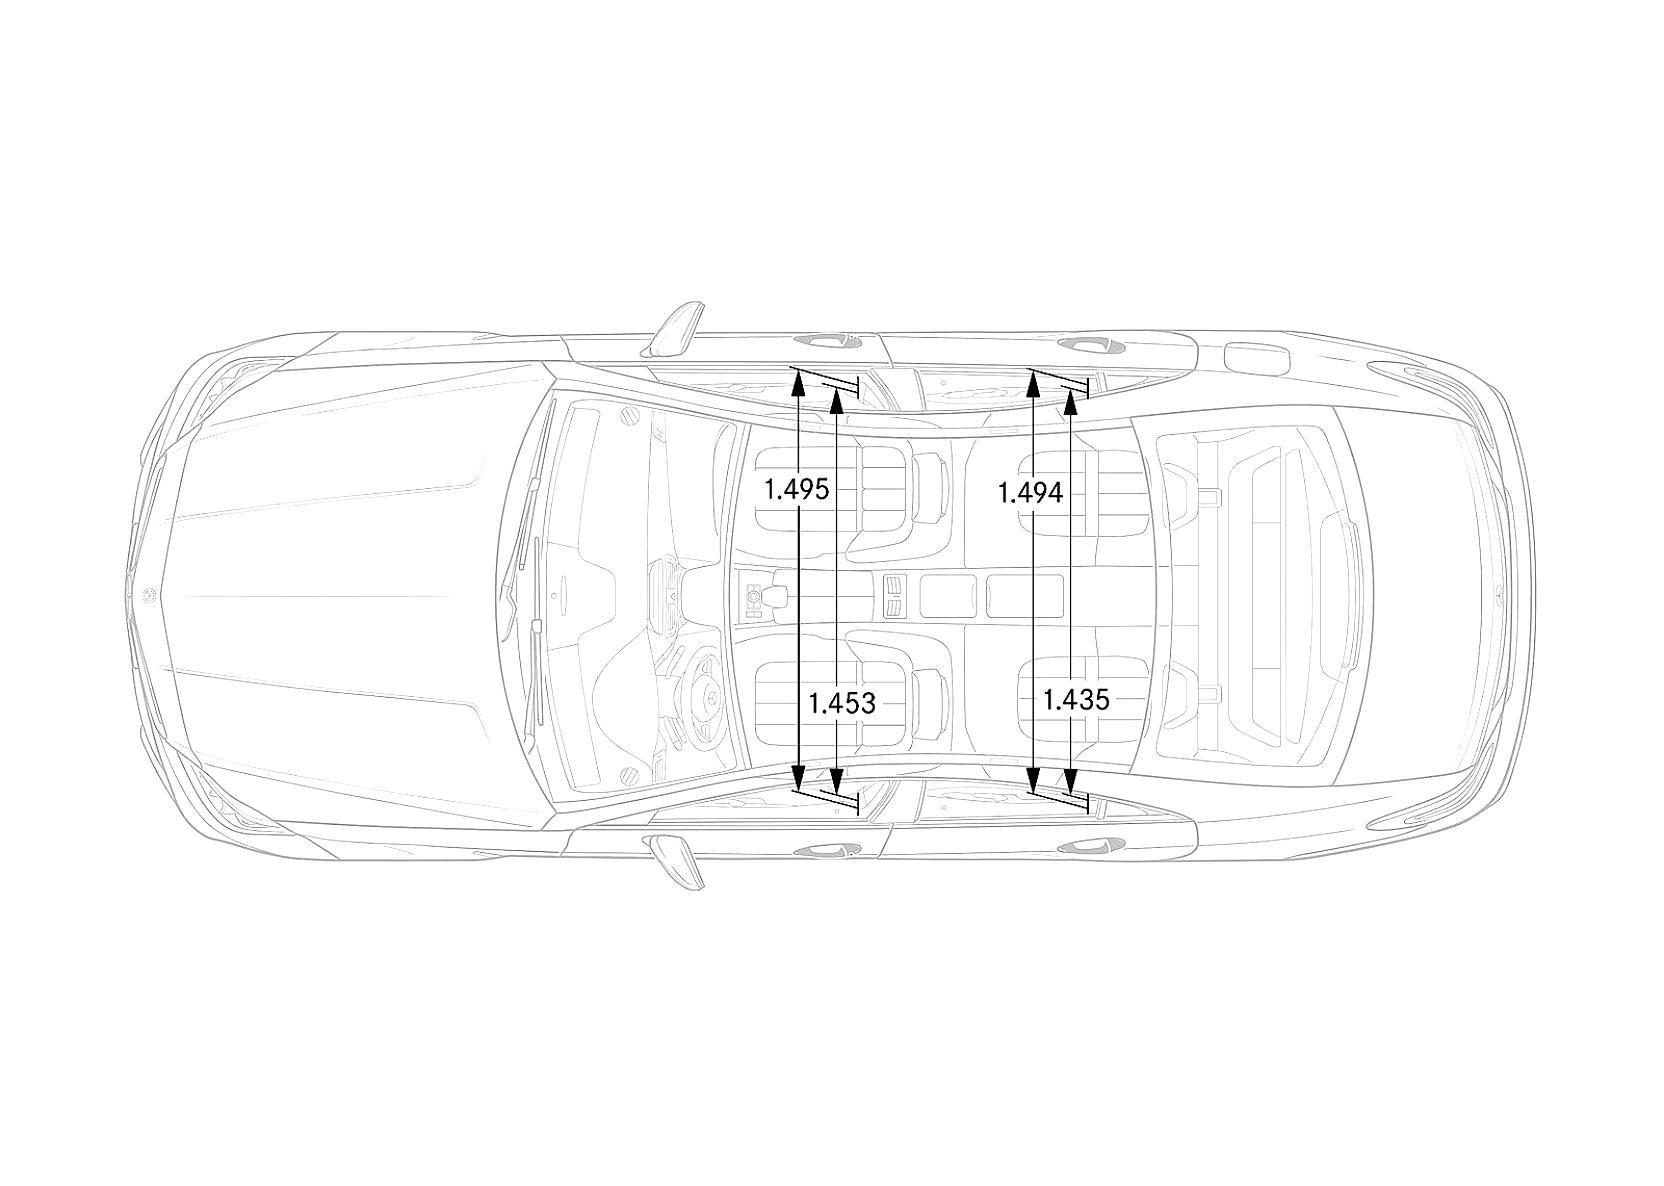 Mercedes Benz CLS 63 AMG C218 2014 on MotoImg.com